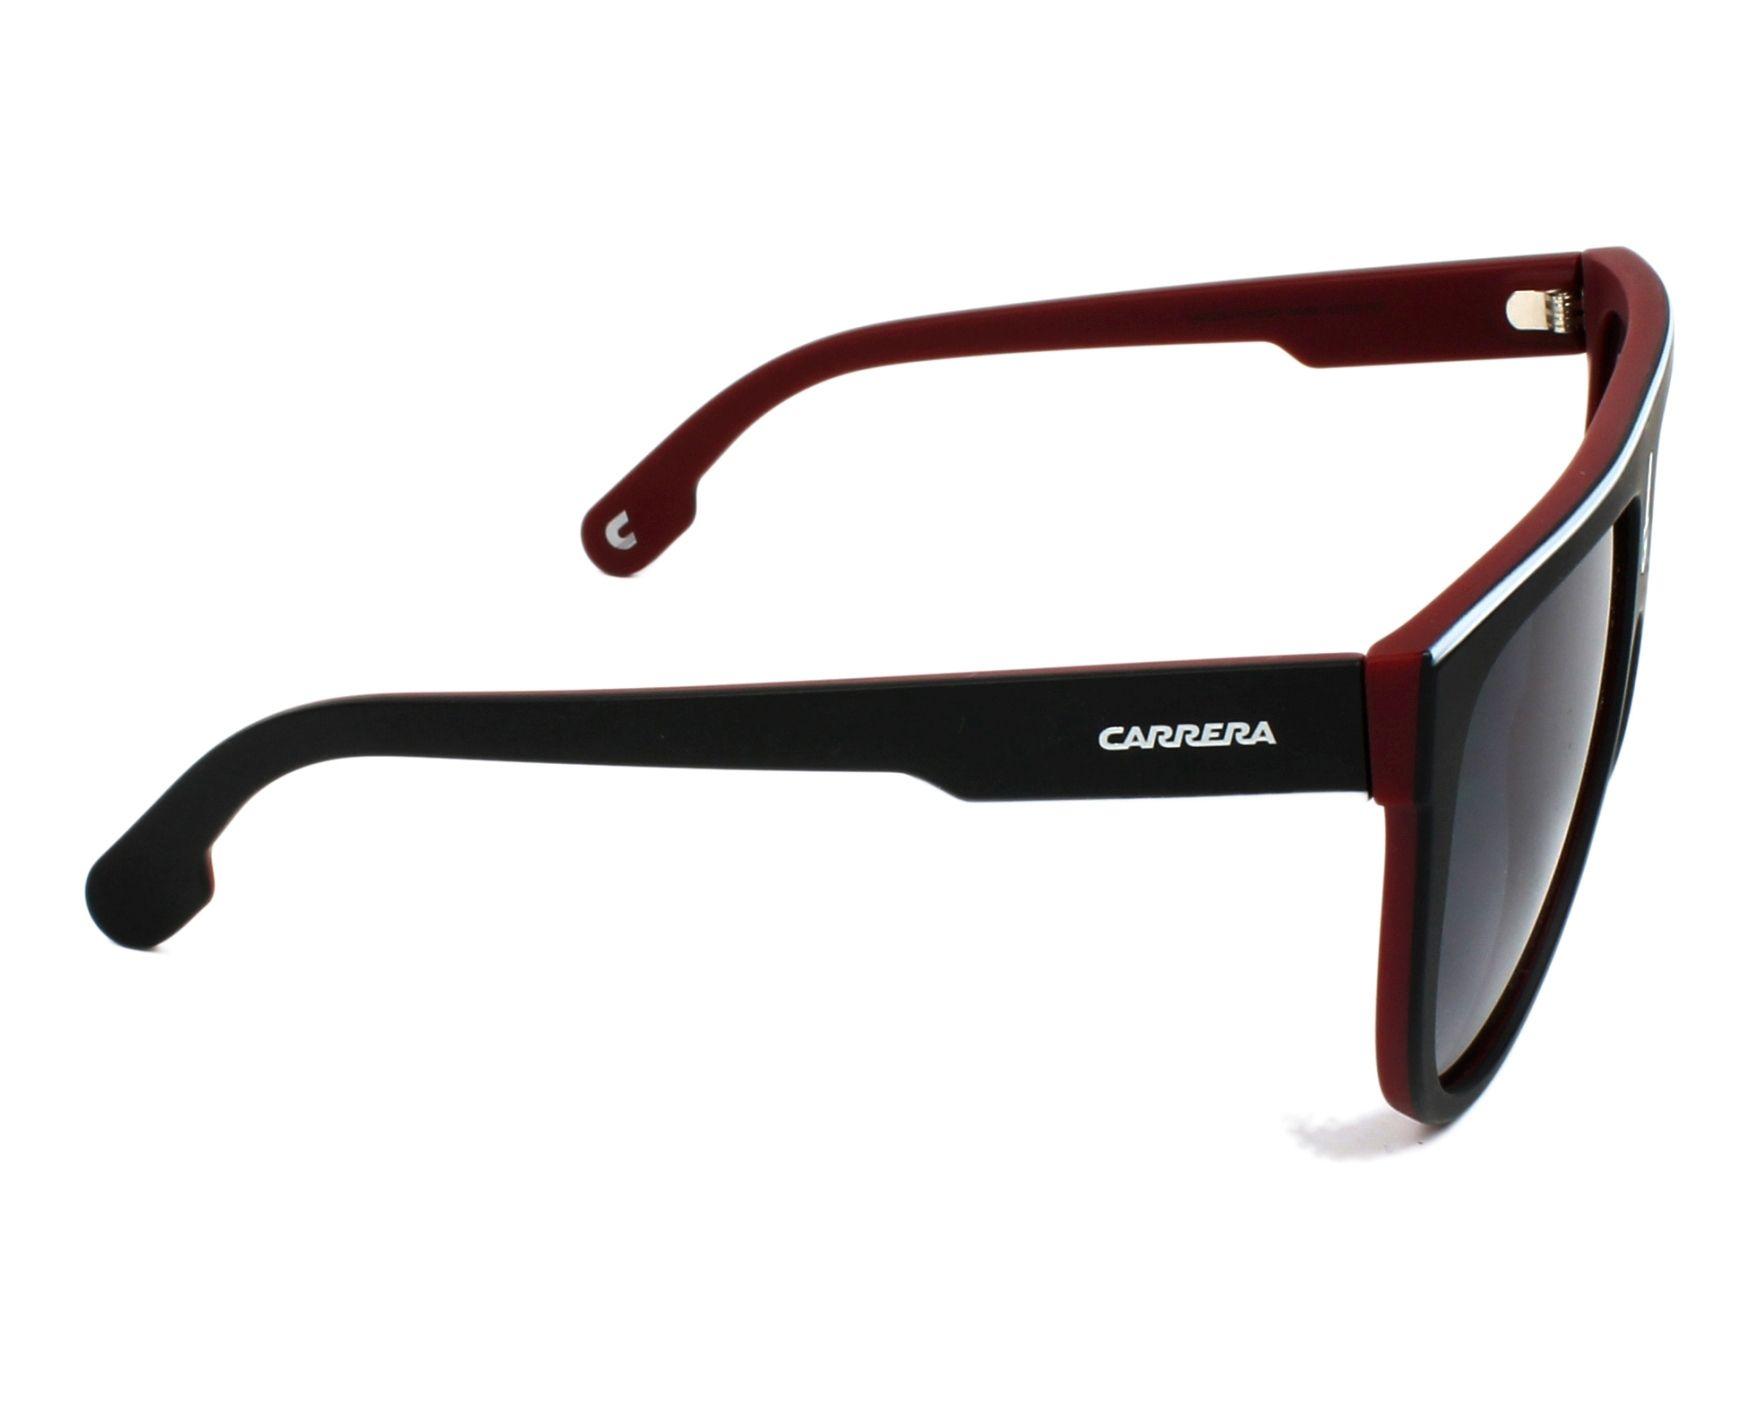 82fd1f400c Sunglasses Carrera FLAGTOP BLX 9O 60-15 Black Bordeaux side view